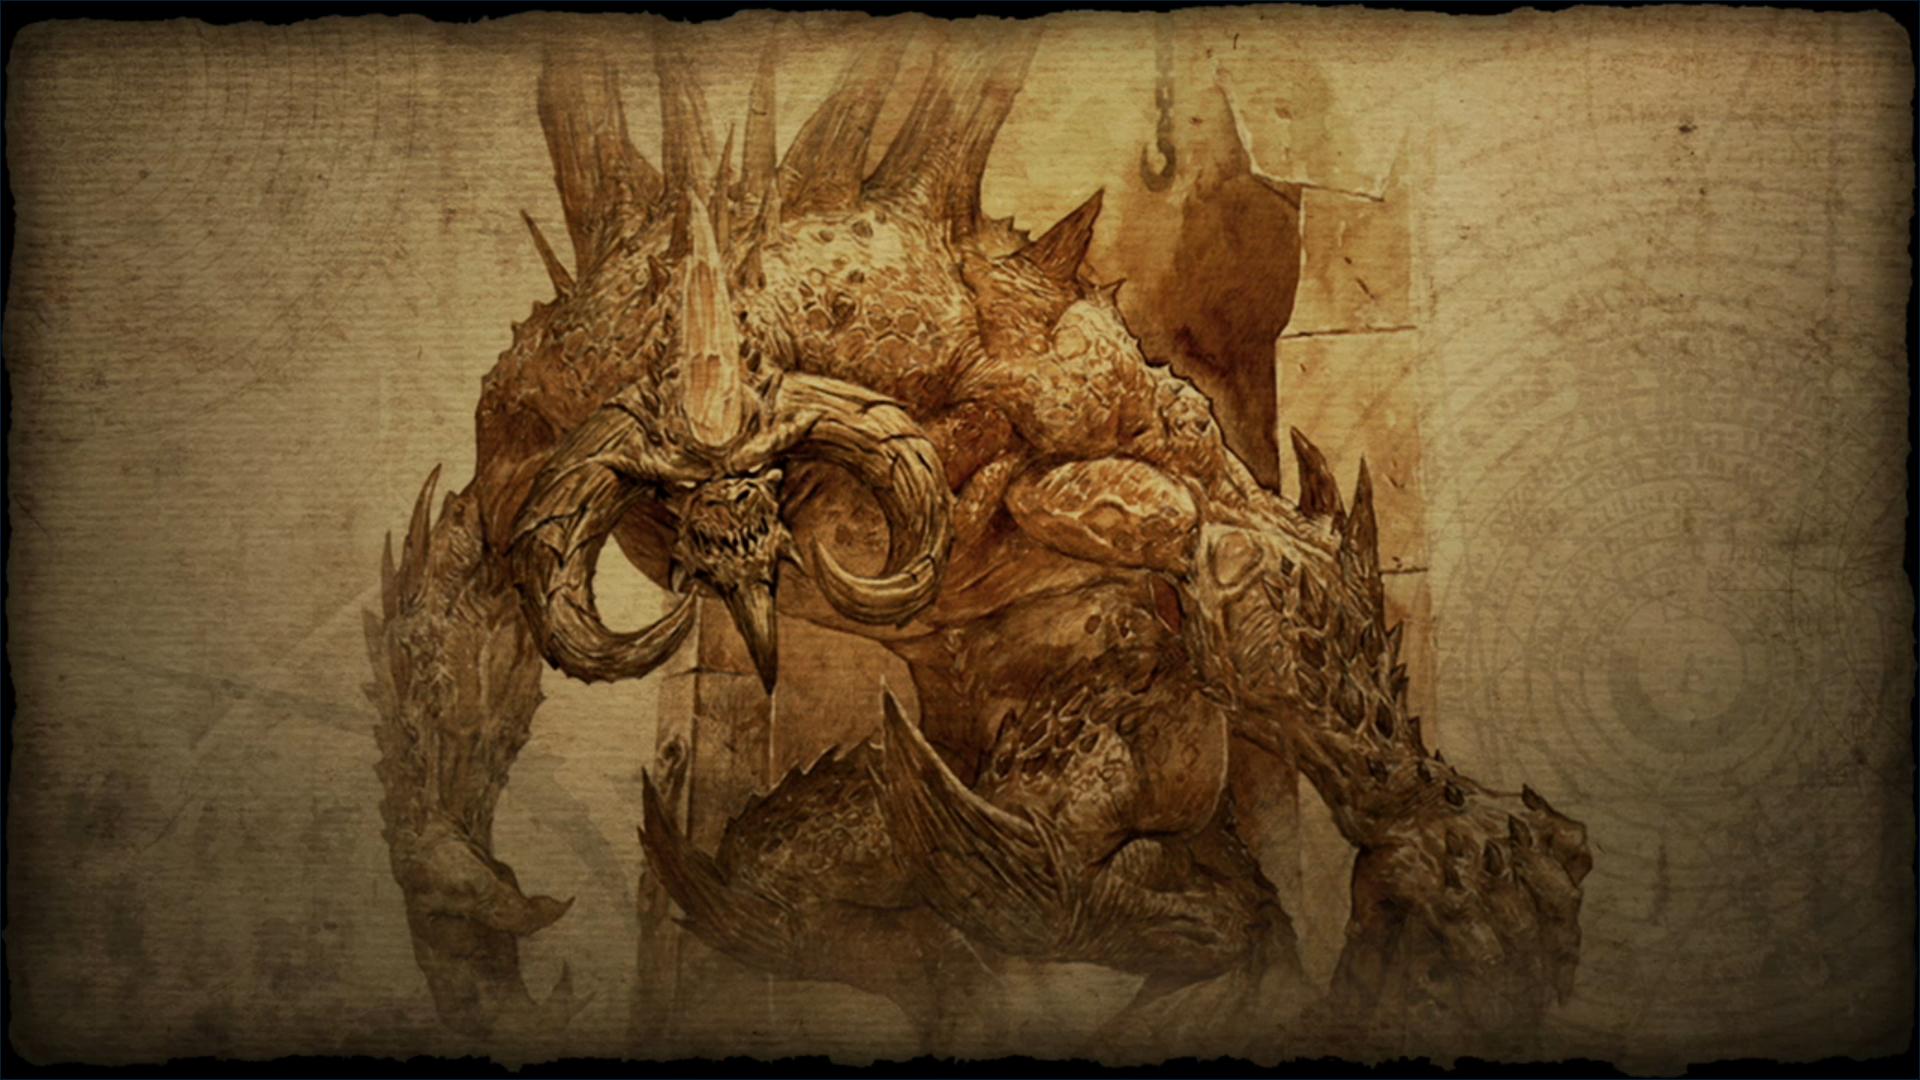 Warcry.ru — BlizzCon 2011: История и игровой мир Diablo 3